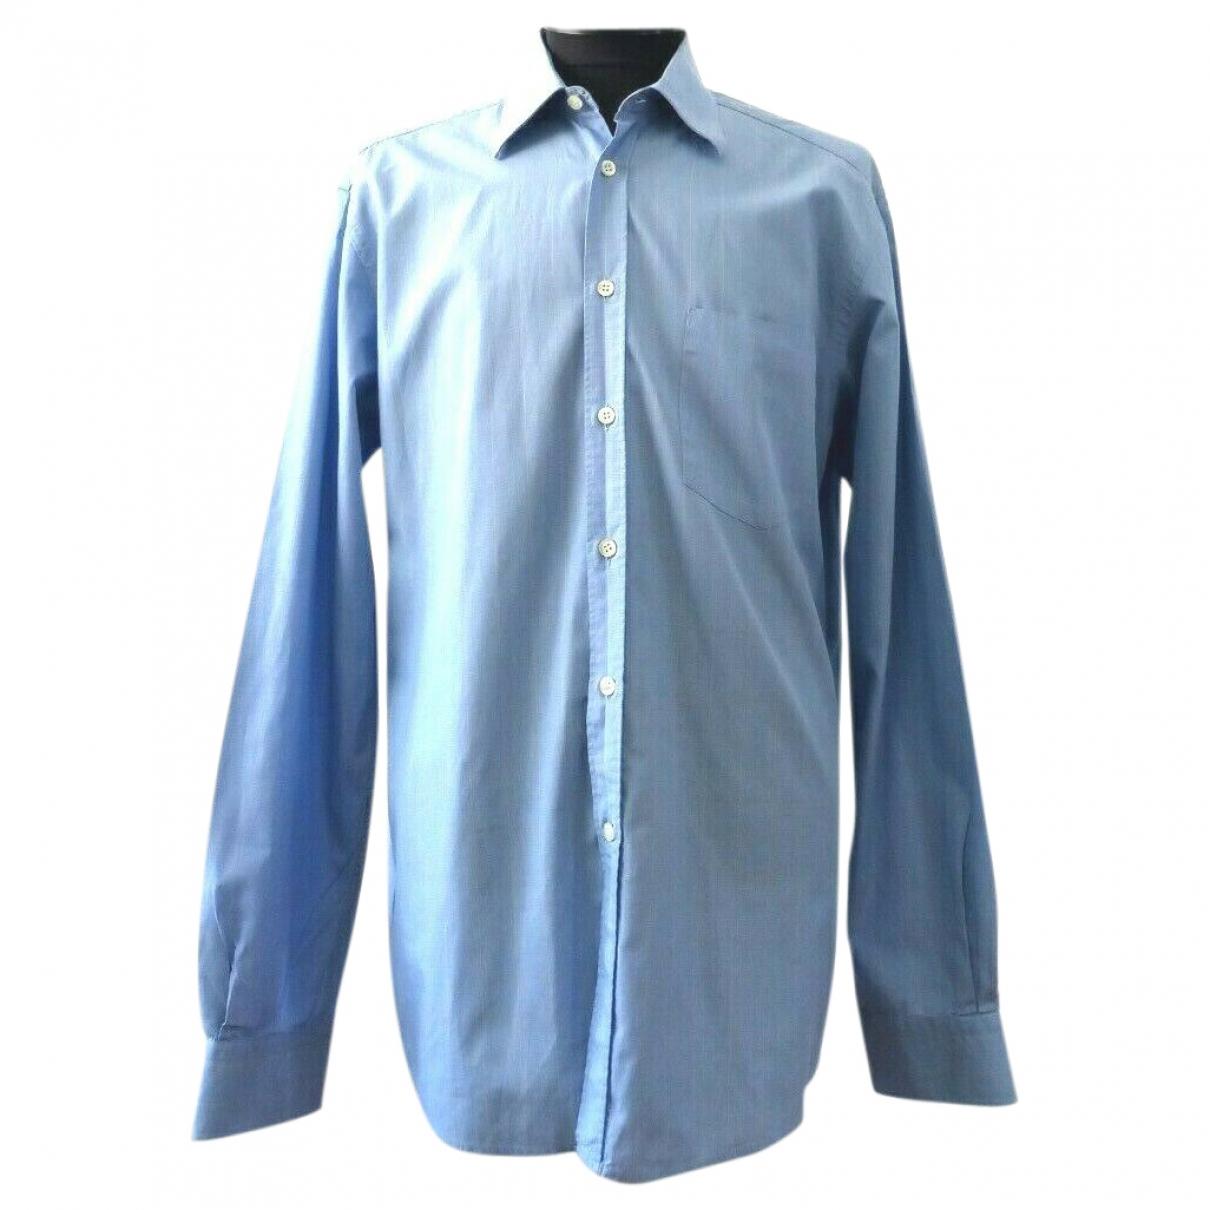 Boss \N Blue Cotton Shirts for Men 39 EU (tour de cou / collar)